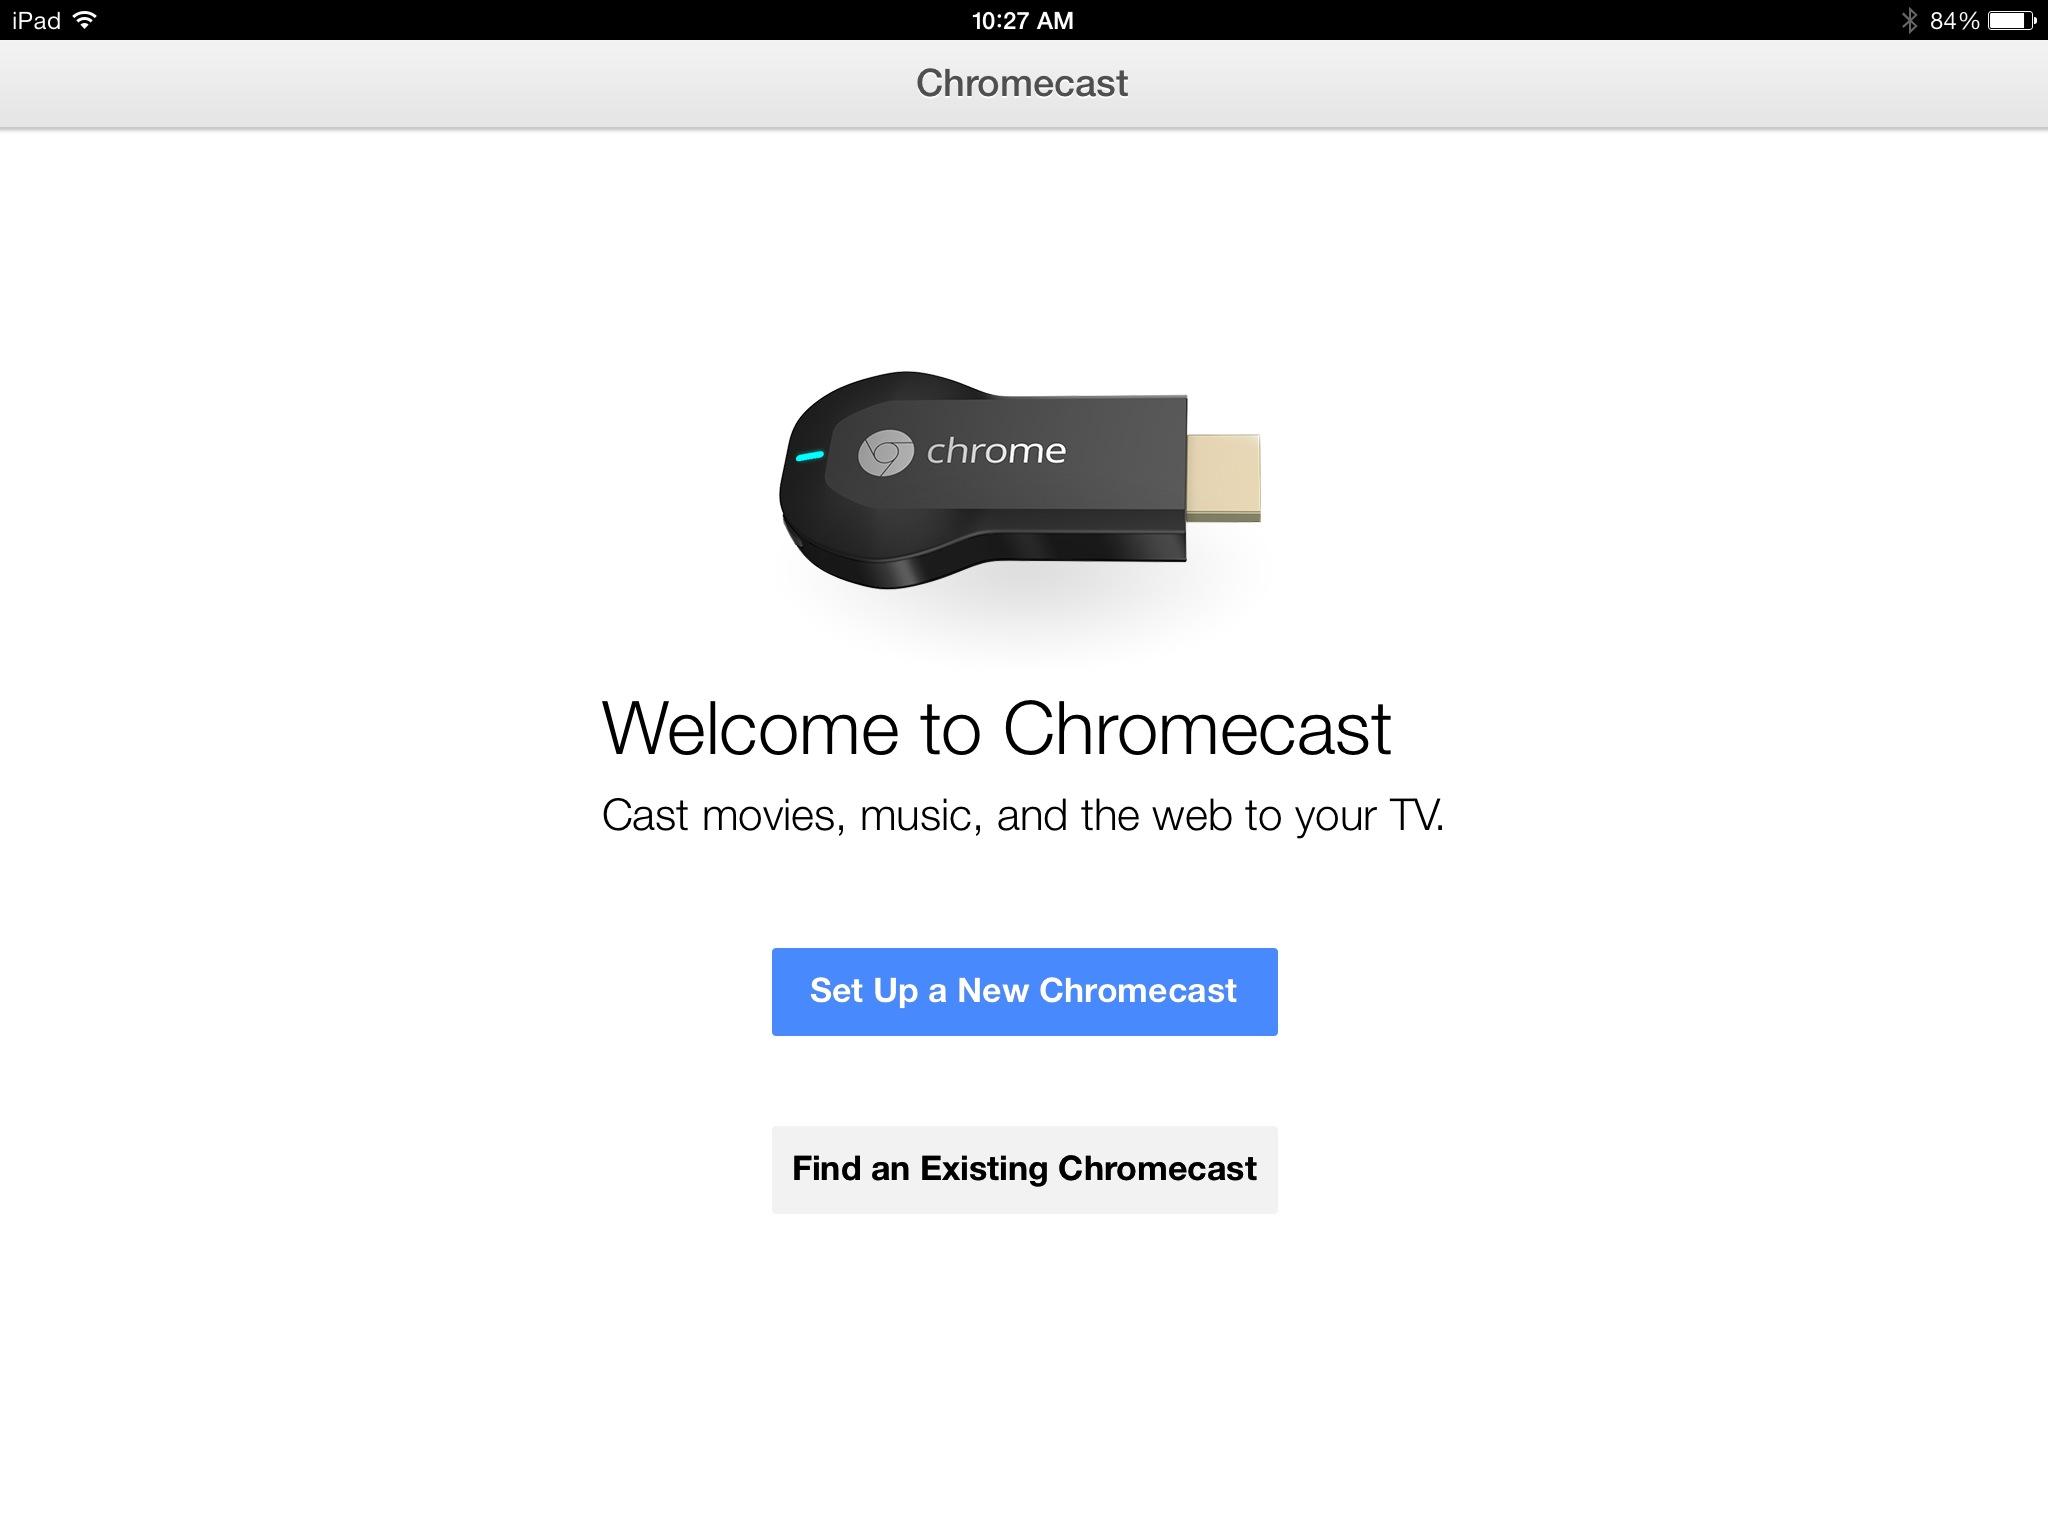 Chromecast App for iPhone and iPad Arrives